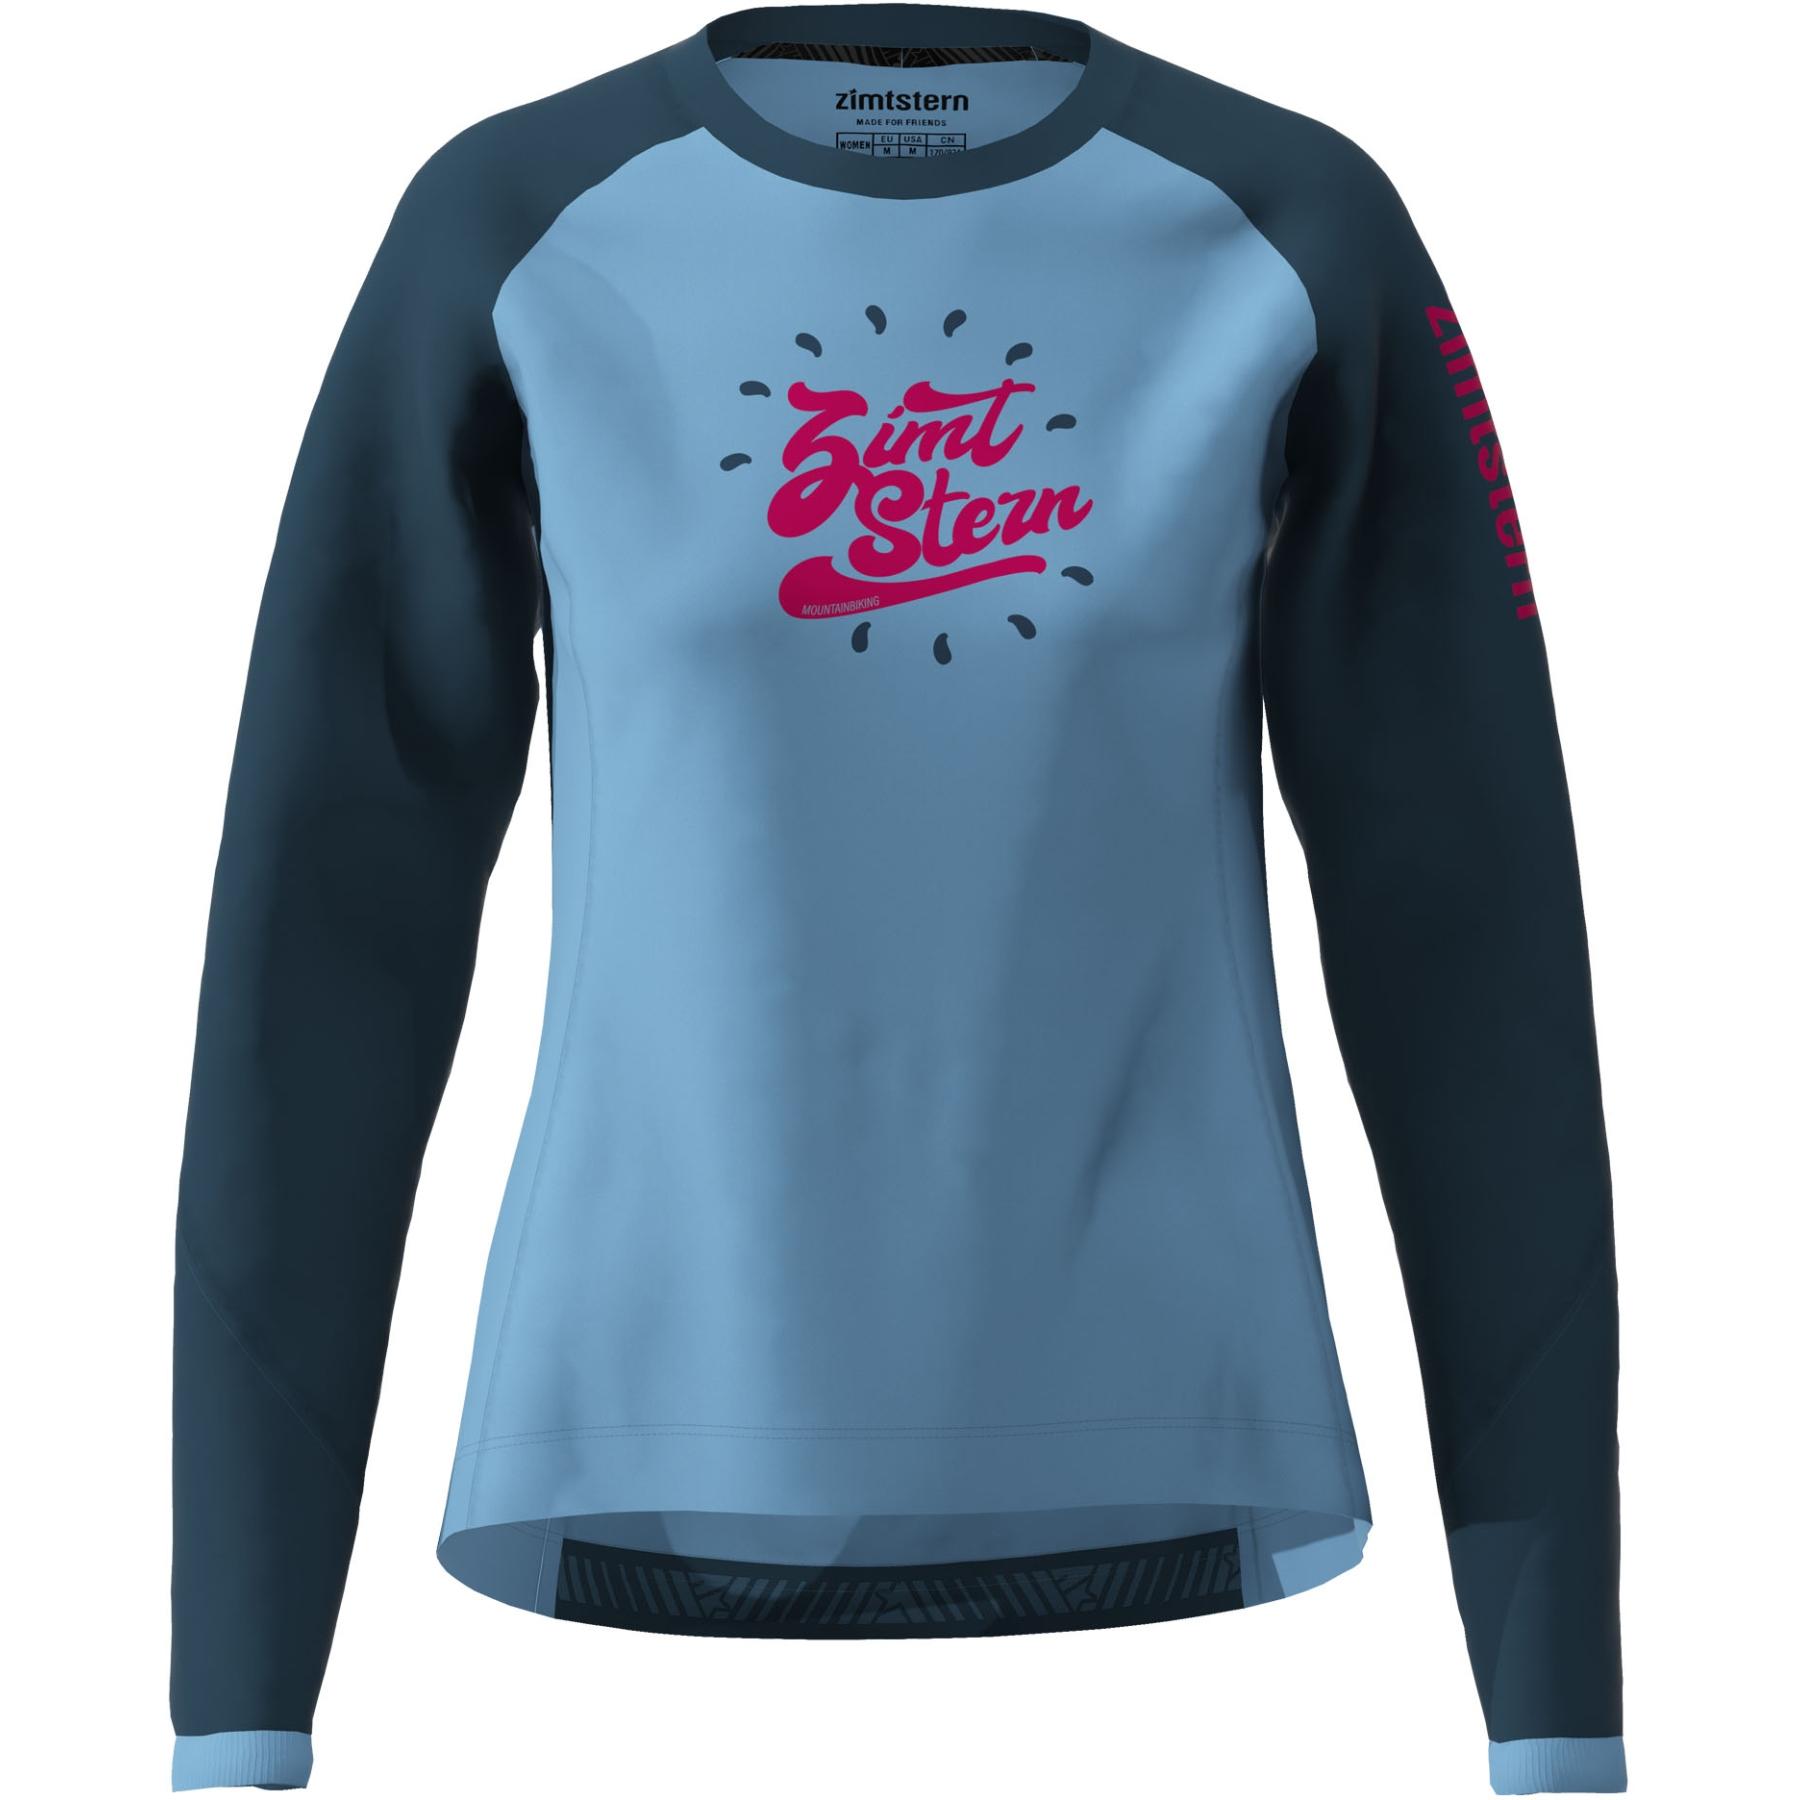 Zimtstern PureFlowz Langarm-Shirt Damen - heritage blue/french navy